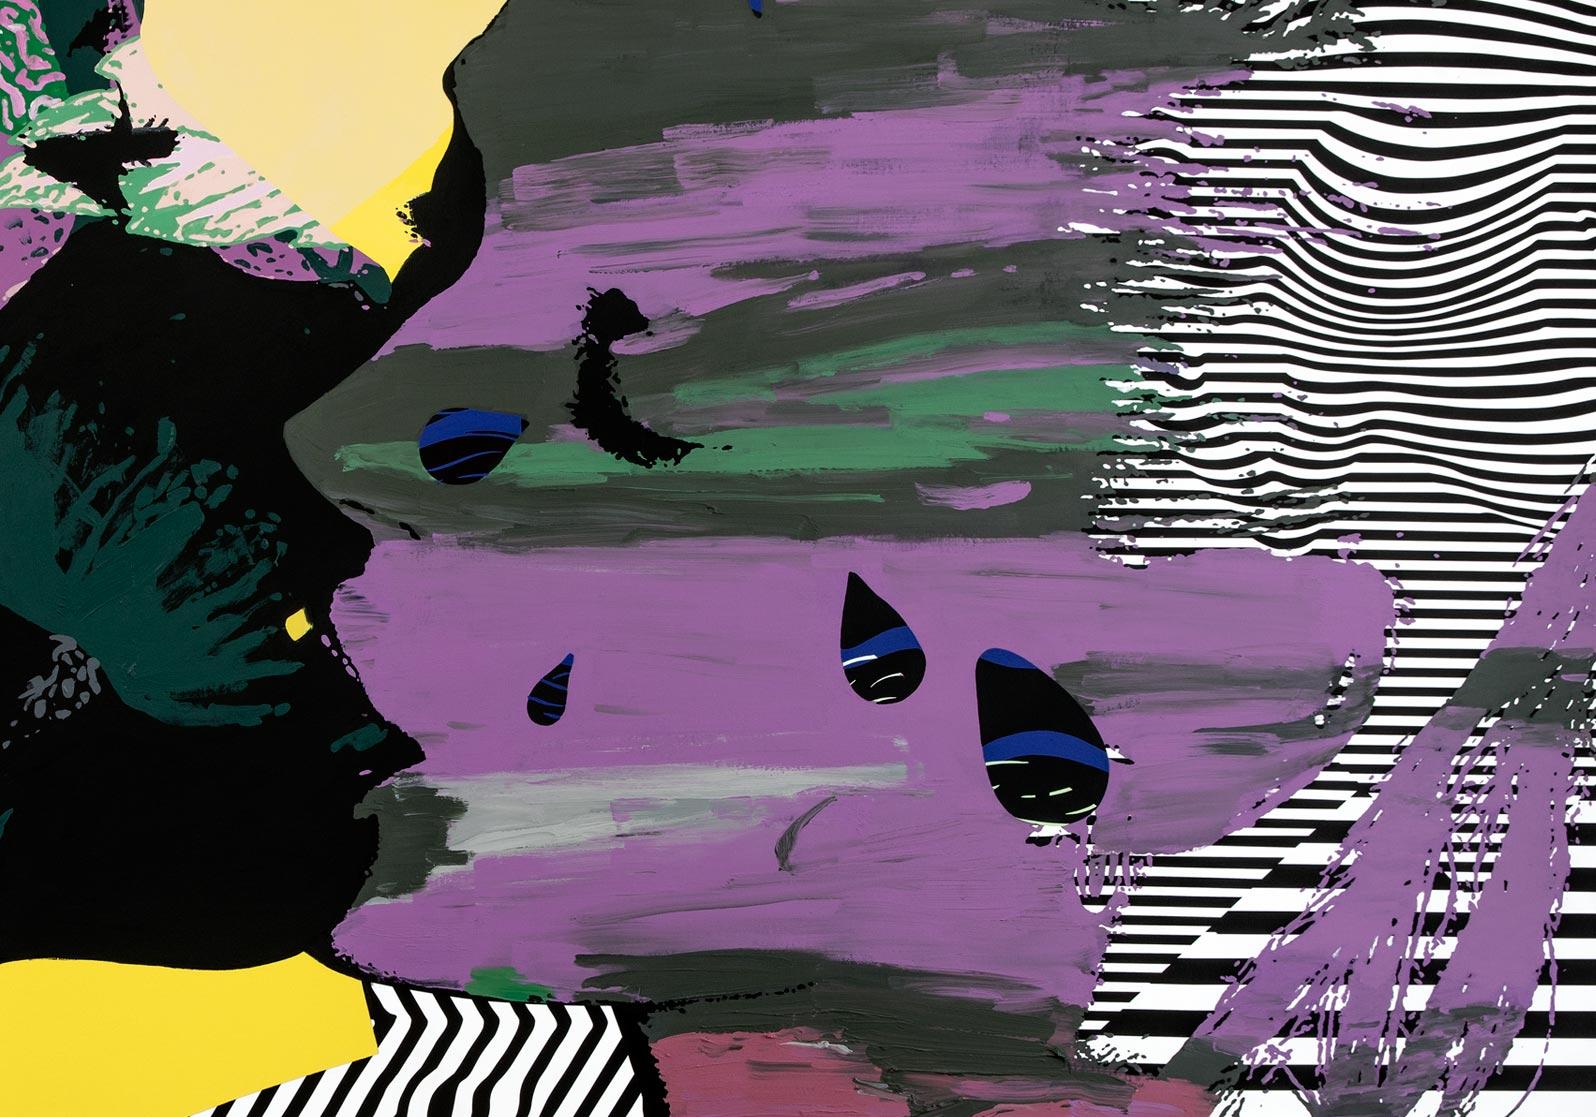 Anca Stefanescu | Contemporary Creative Painter, TheGardenOfLove